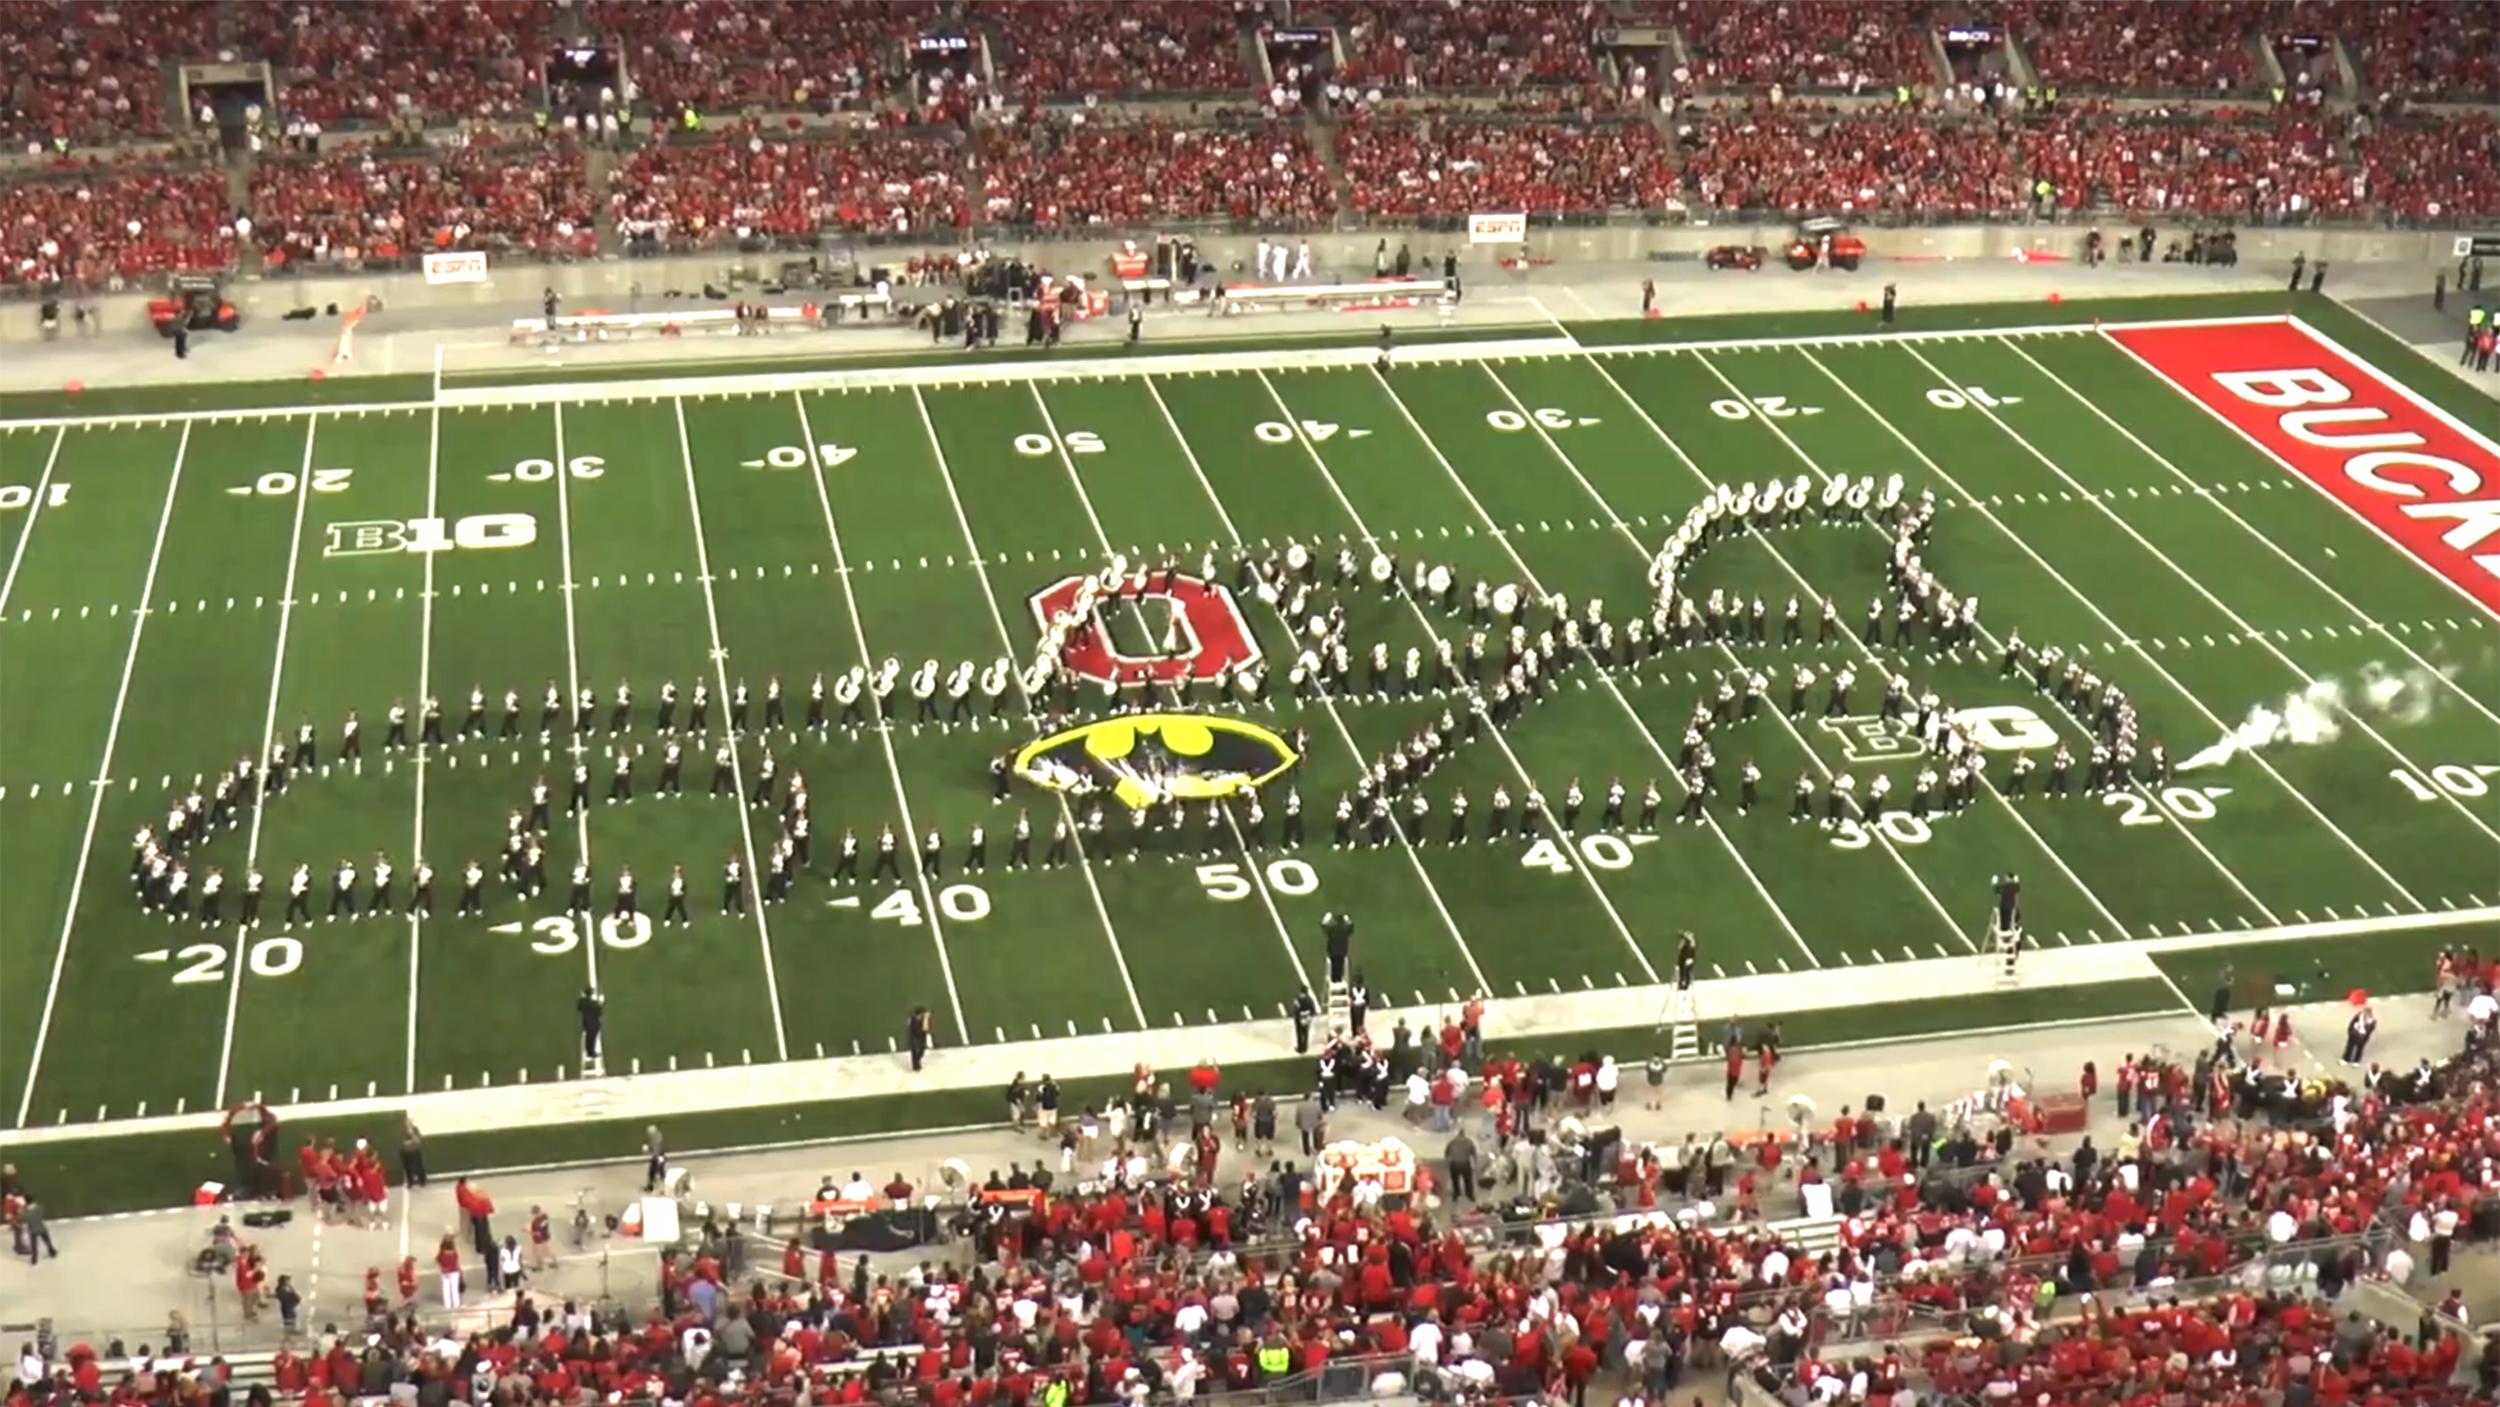 OSU marching band salutes classic TV shows at football